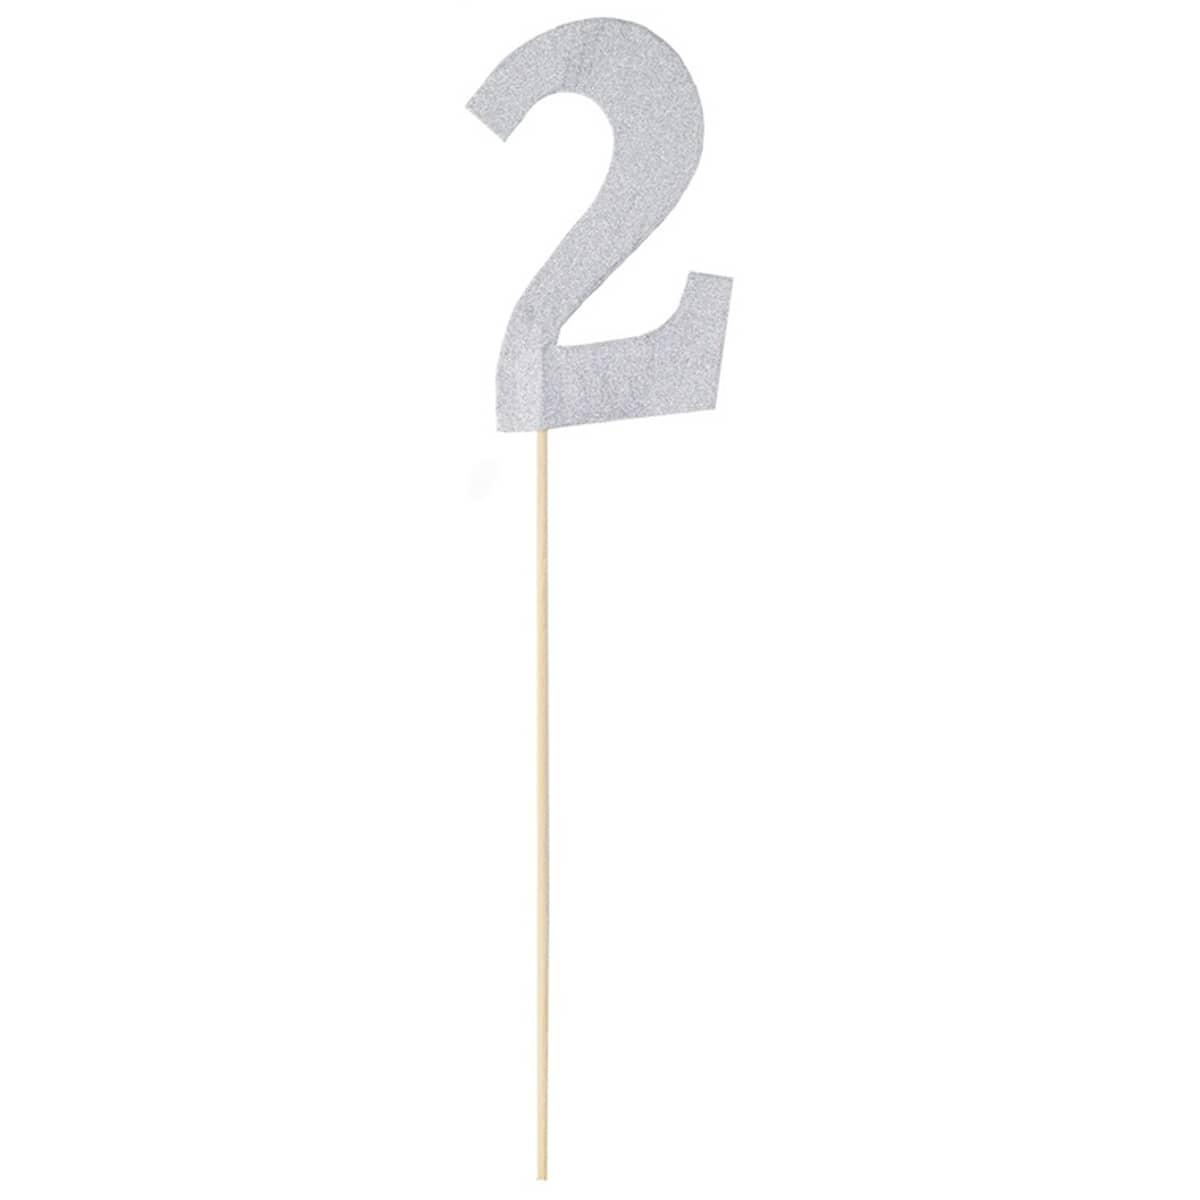 Топпер Цифра 2 серебро блеск 27см